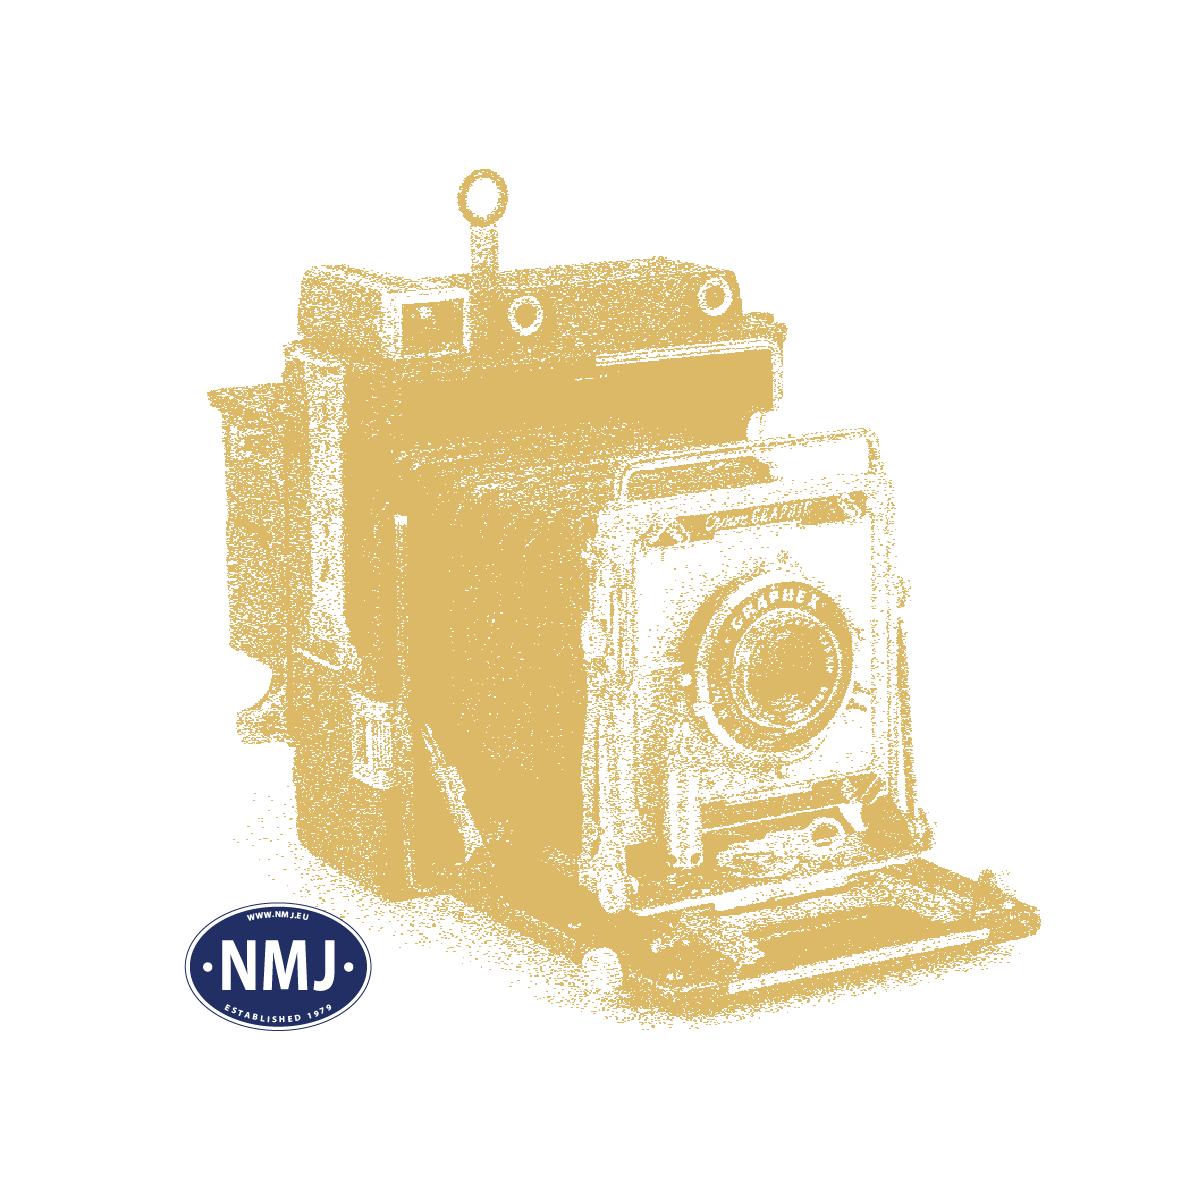 TAM82155 - LP-55 Dark Yellow 2, Lacquer Paint, 10ml